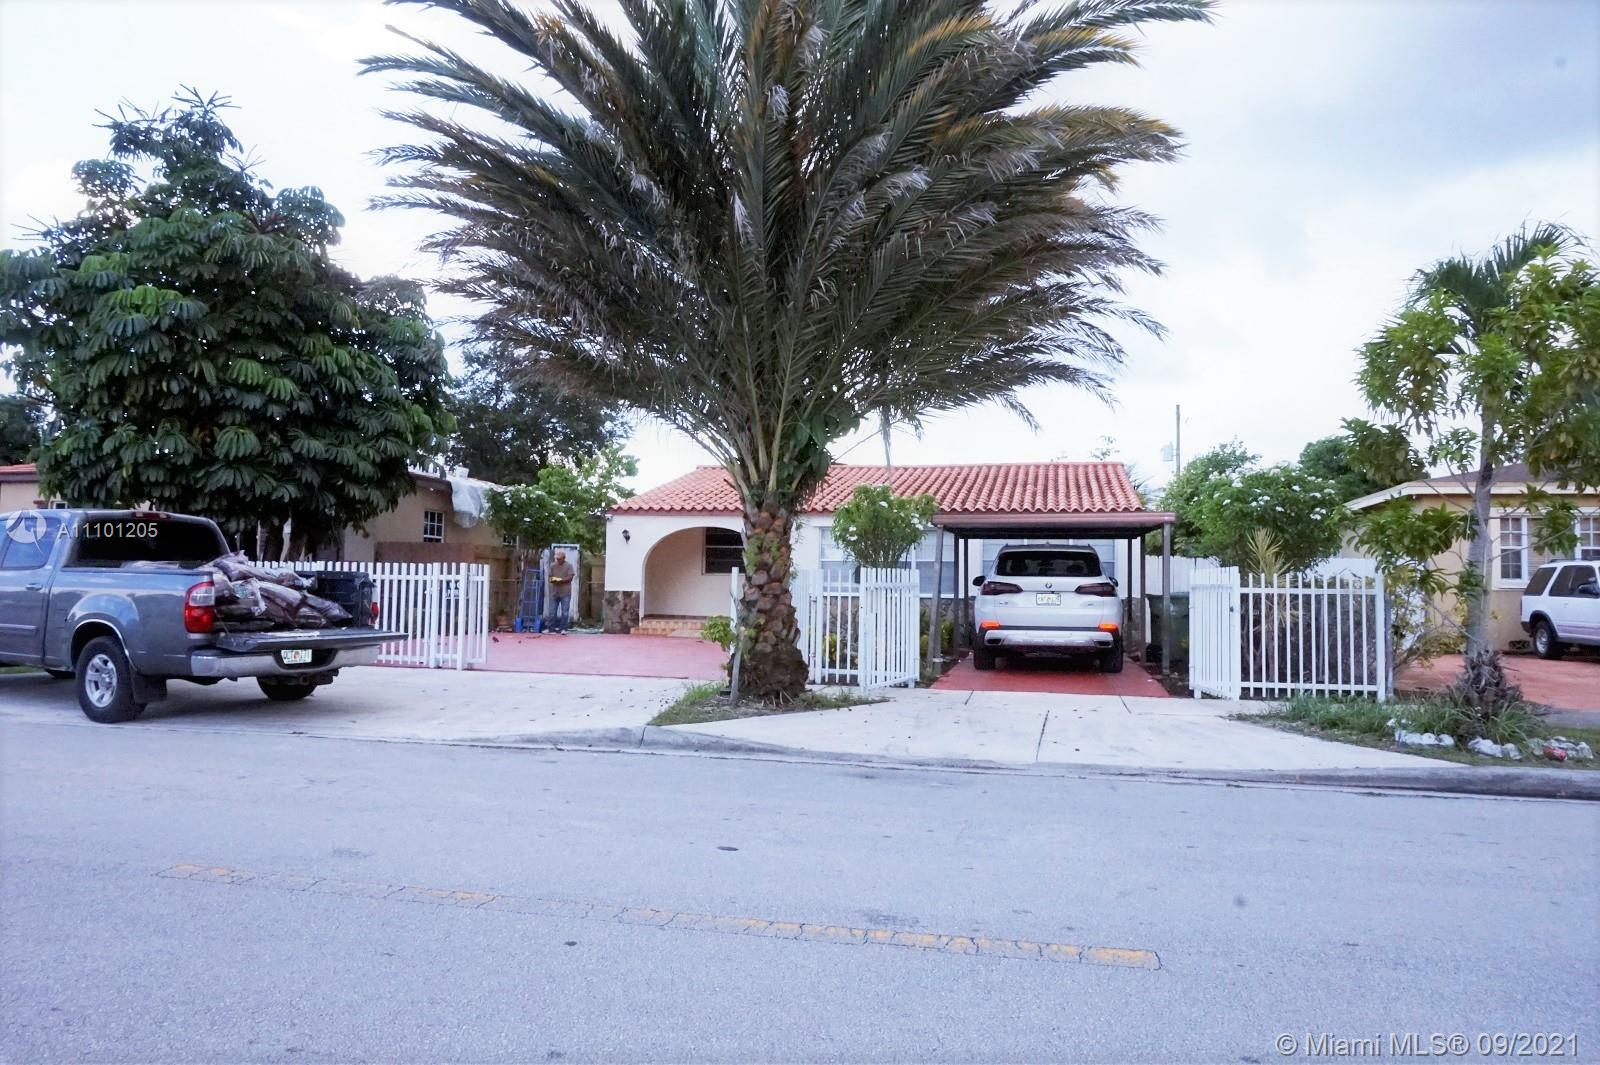 Single Family Home,For Sale,126 E 13th St, Hialeah, Florida 33010,Brickell,realty,broker,condos near me